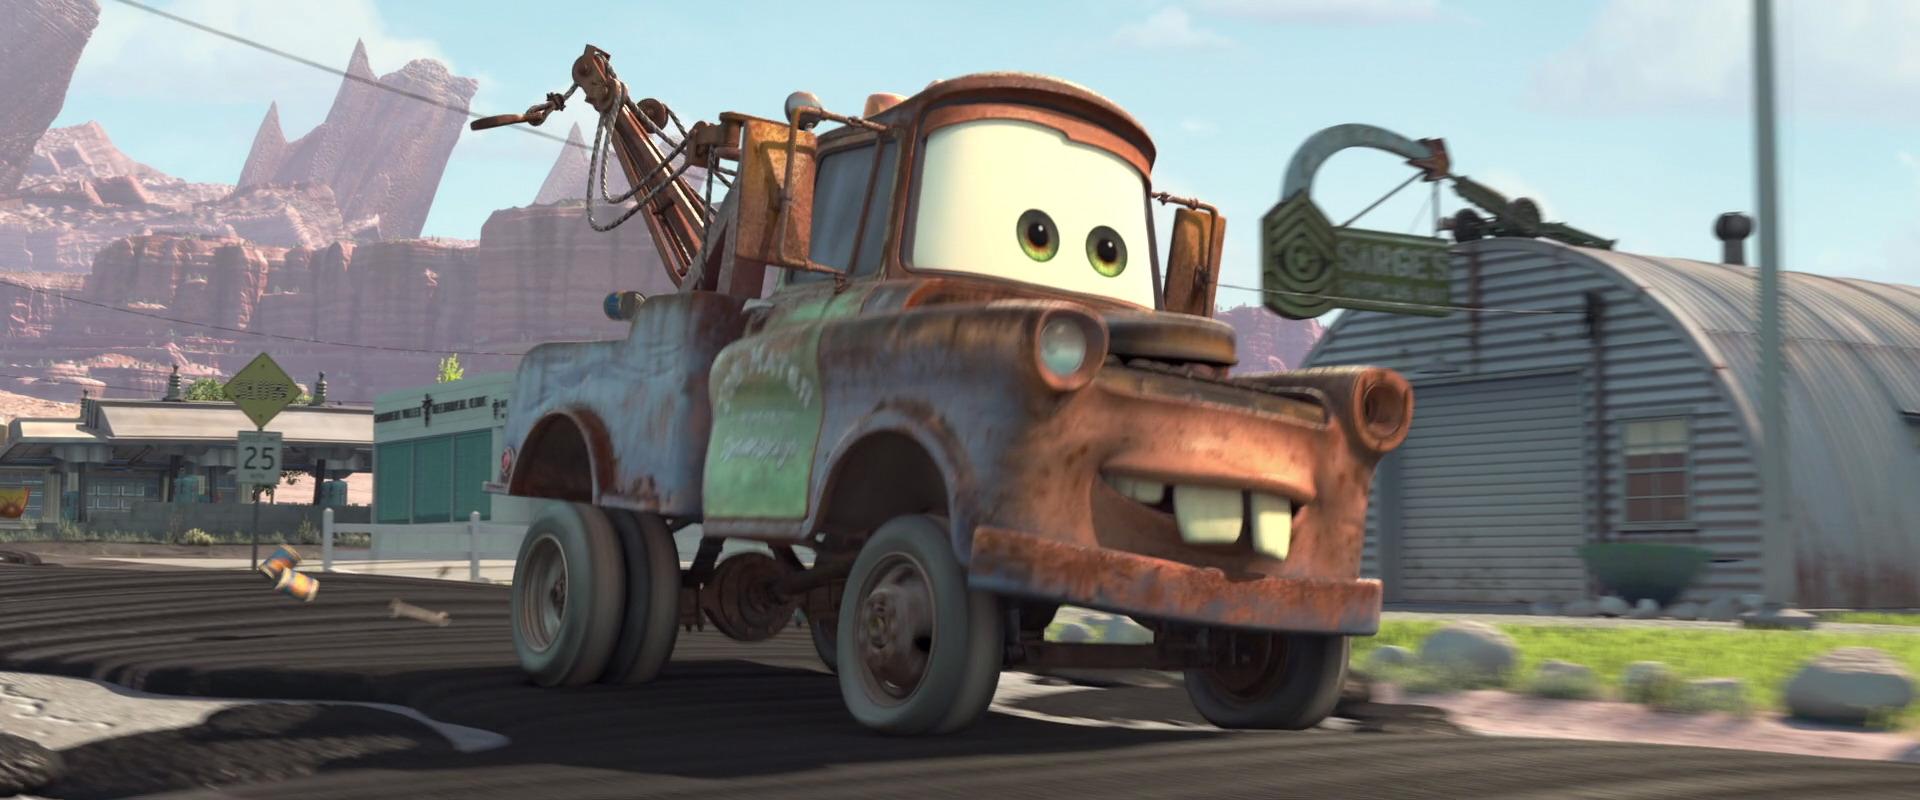 mater character from cars pixar planet fr. Black Bedroom Furniture Sets. Home Design Ideas